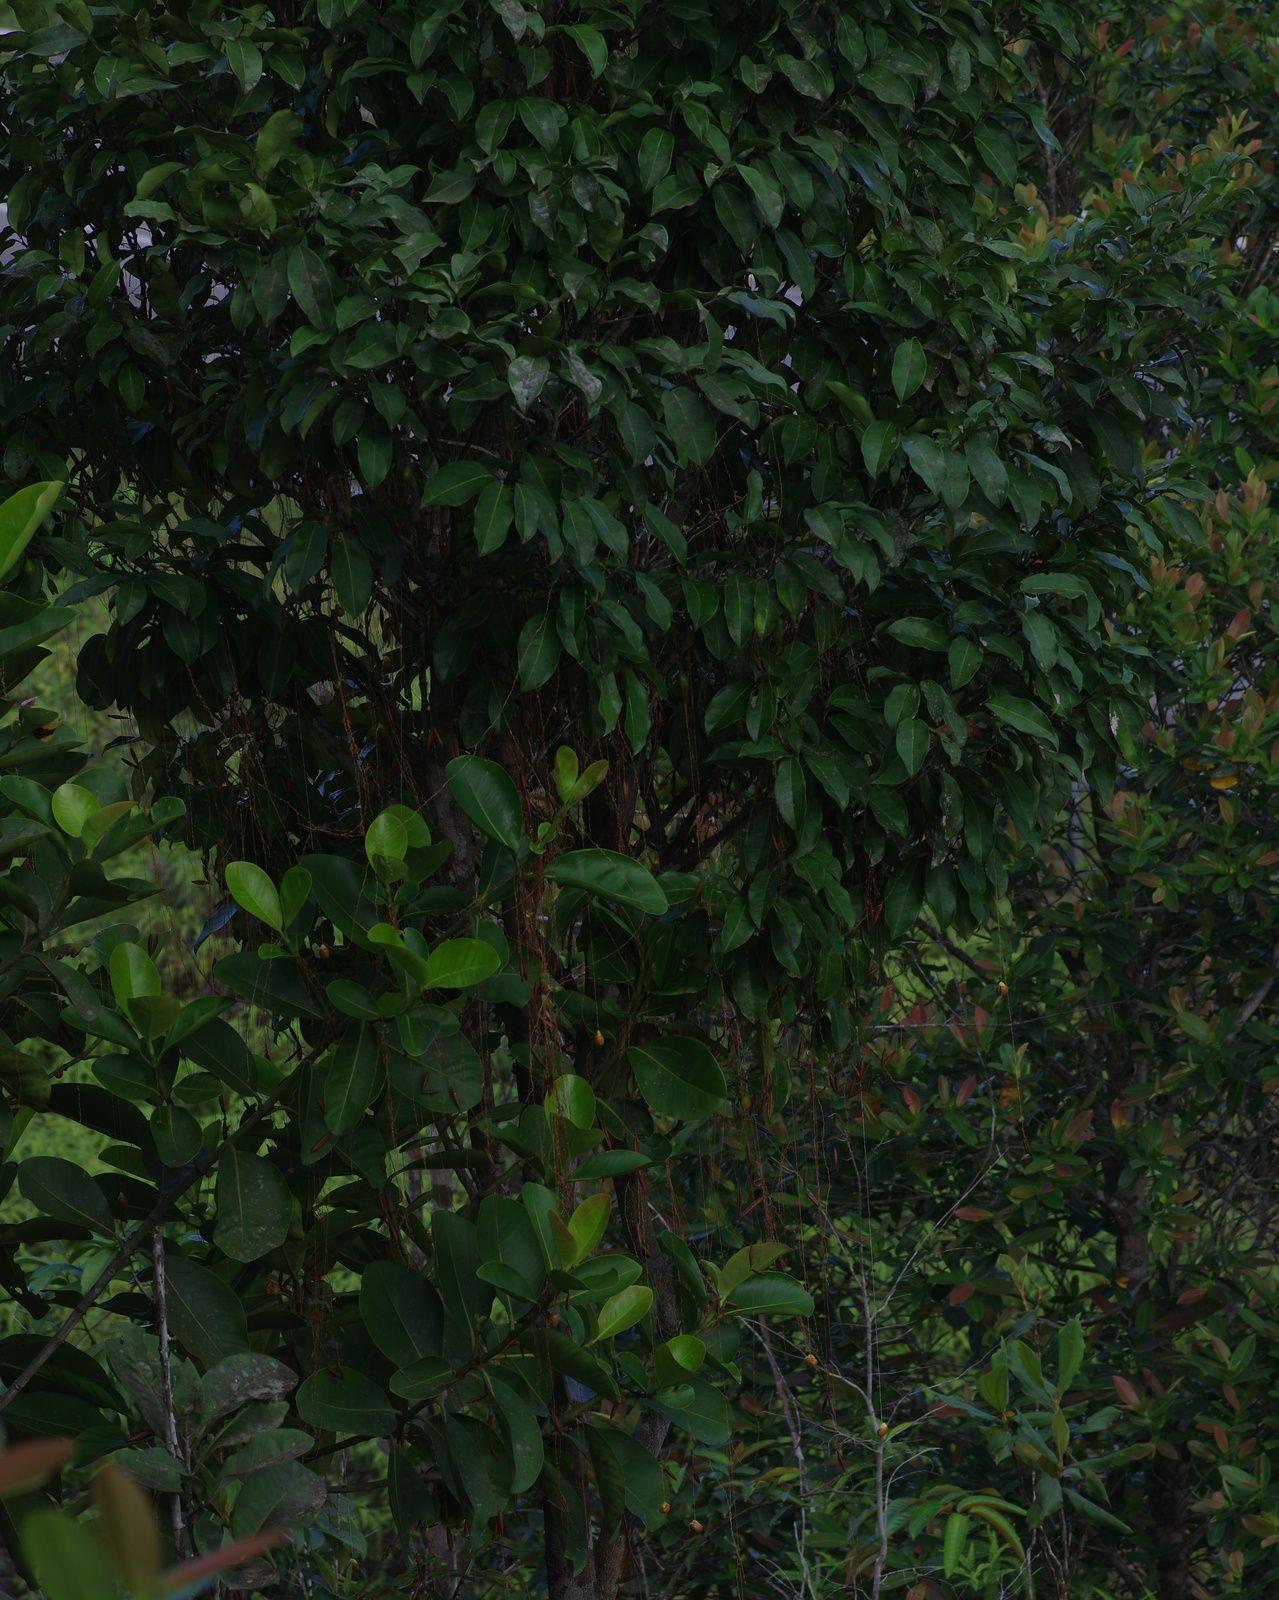 Bocoa prouacensis (boco, bois de fer)